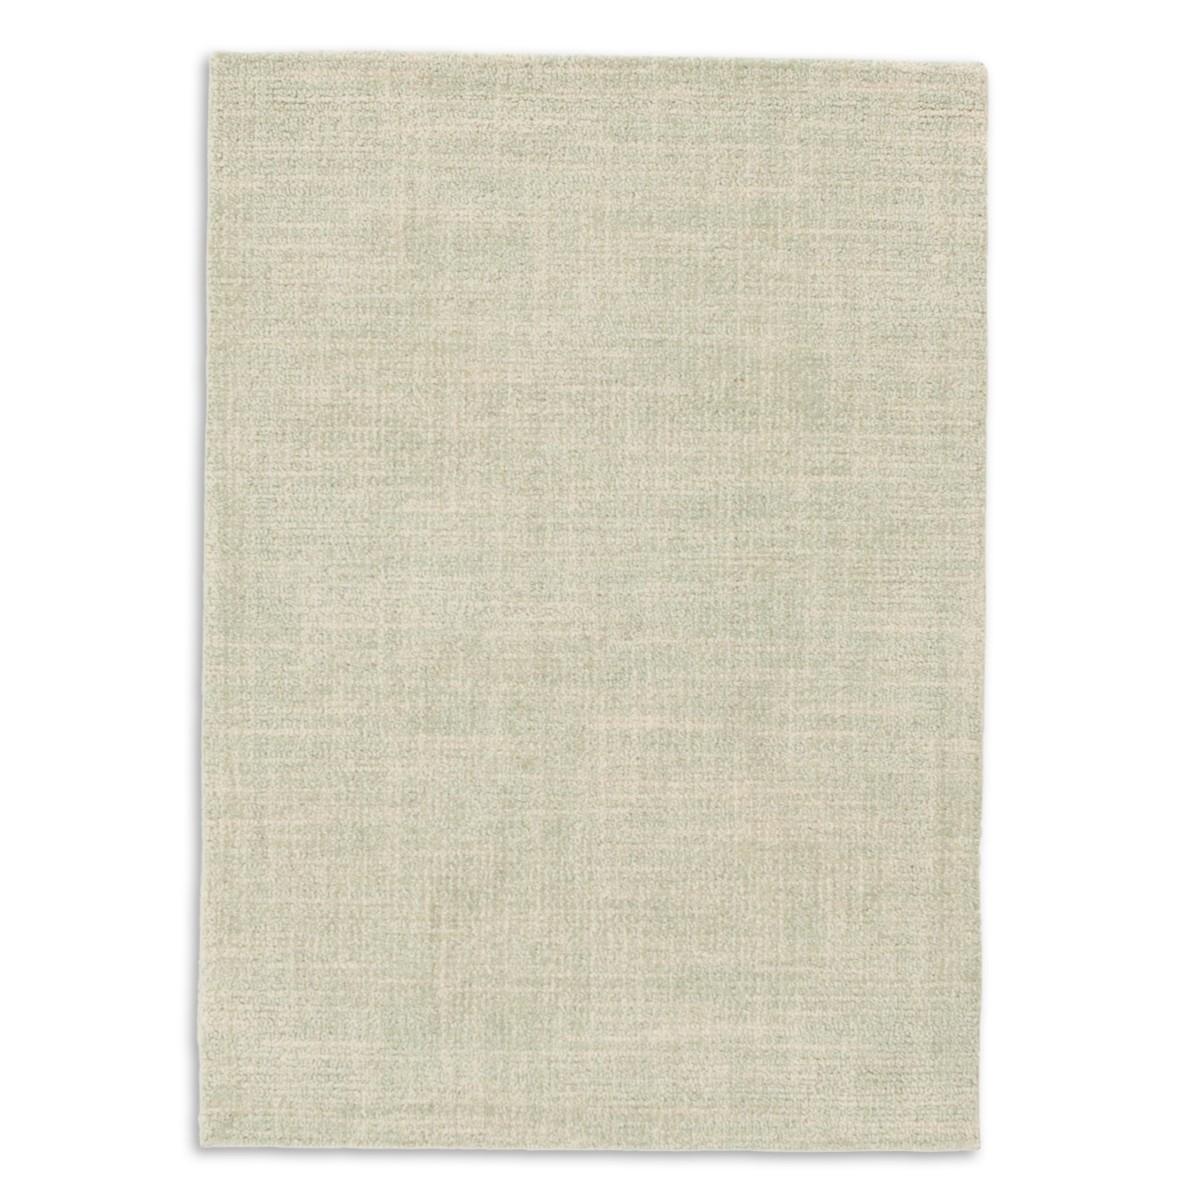 Crosshatch Wool Micro Hooked Rug - Celadon